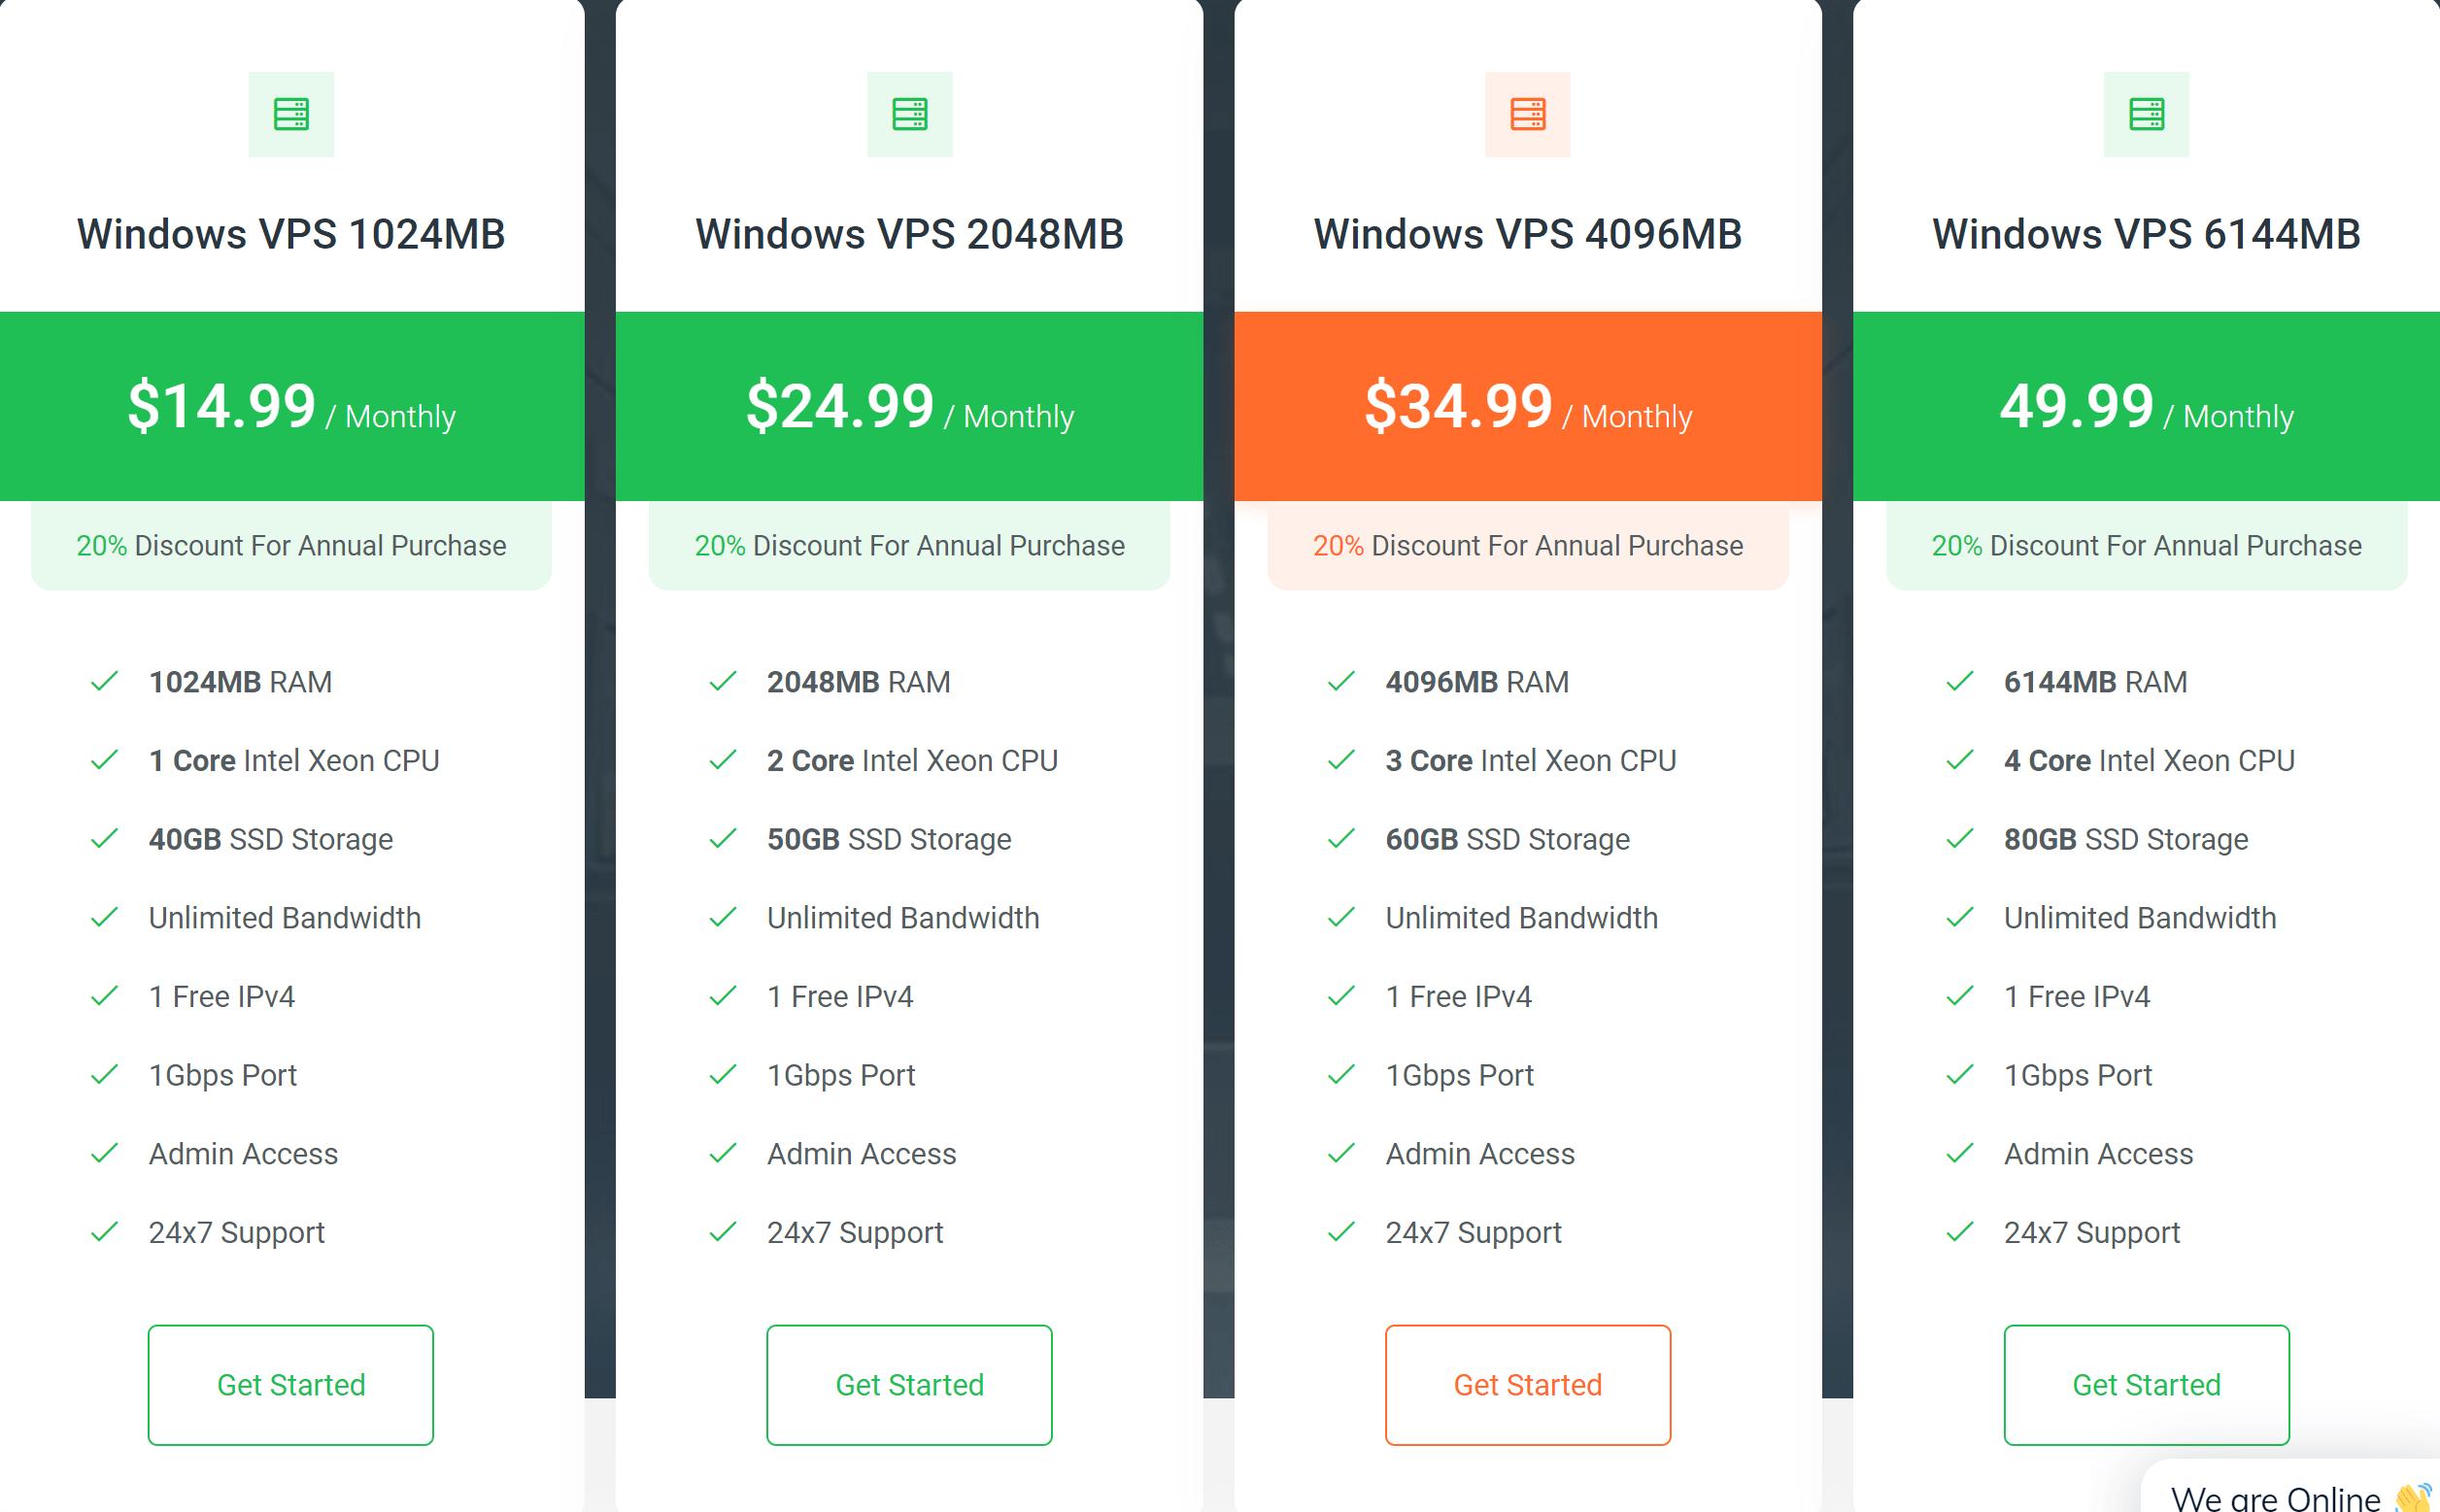 OperaVPS window VPS plans